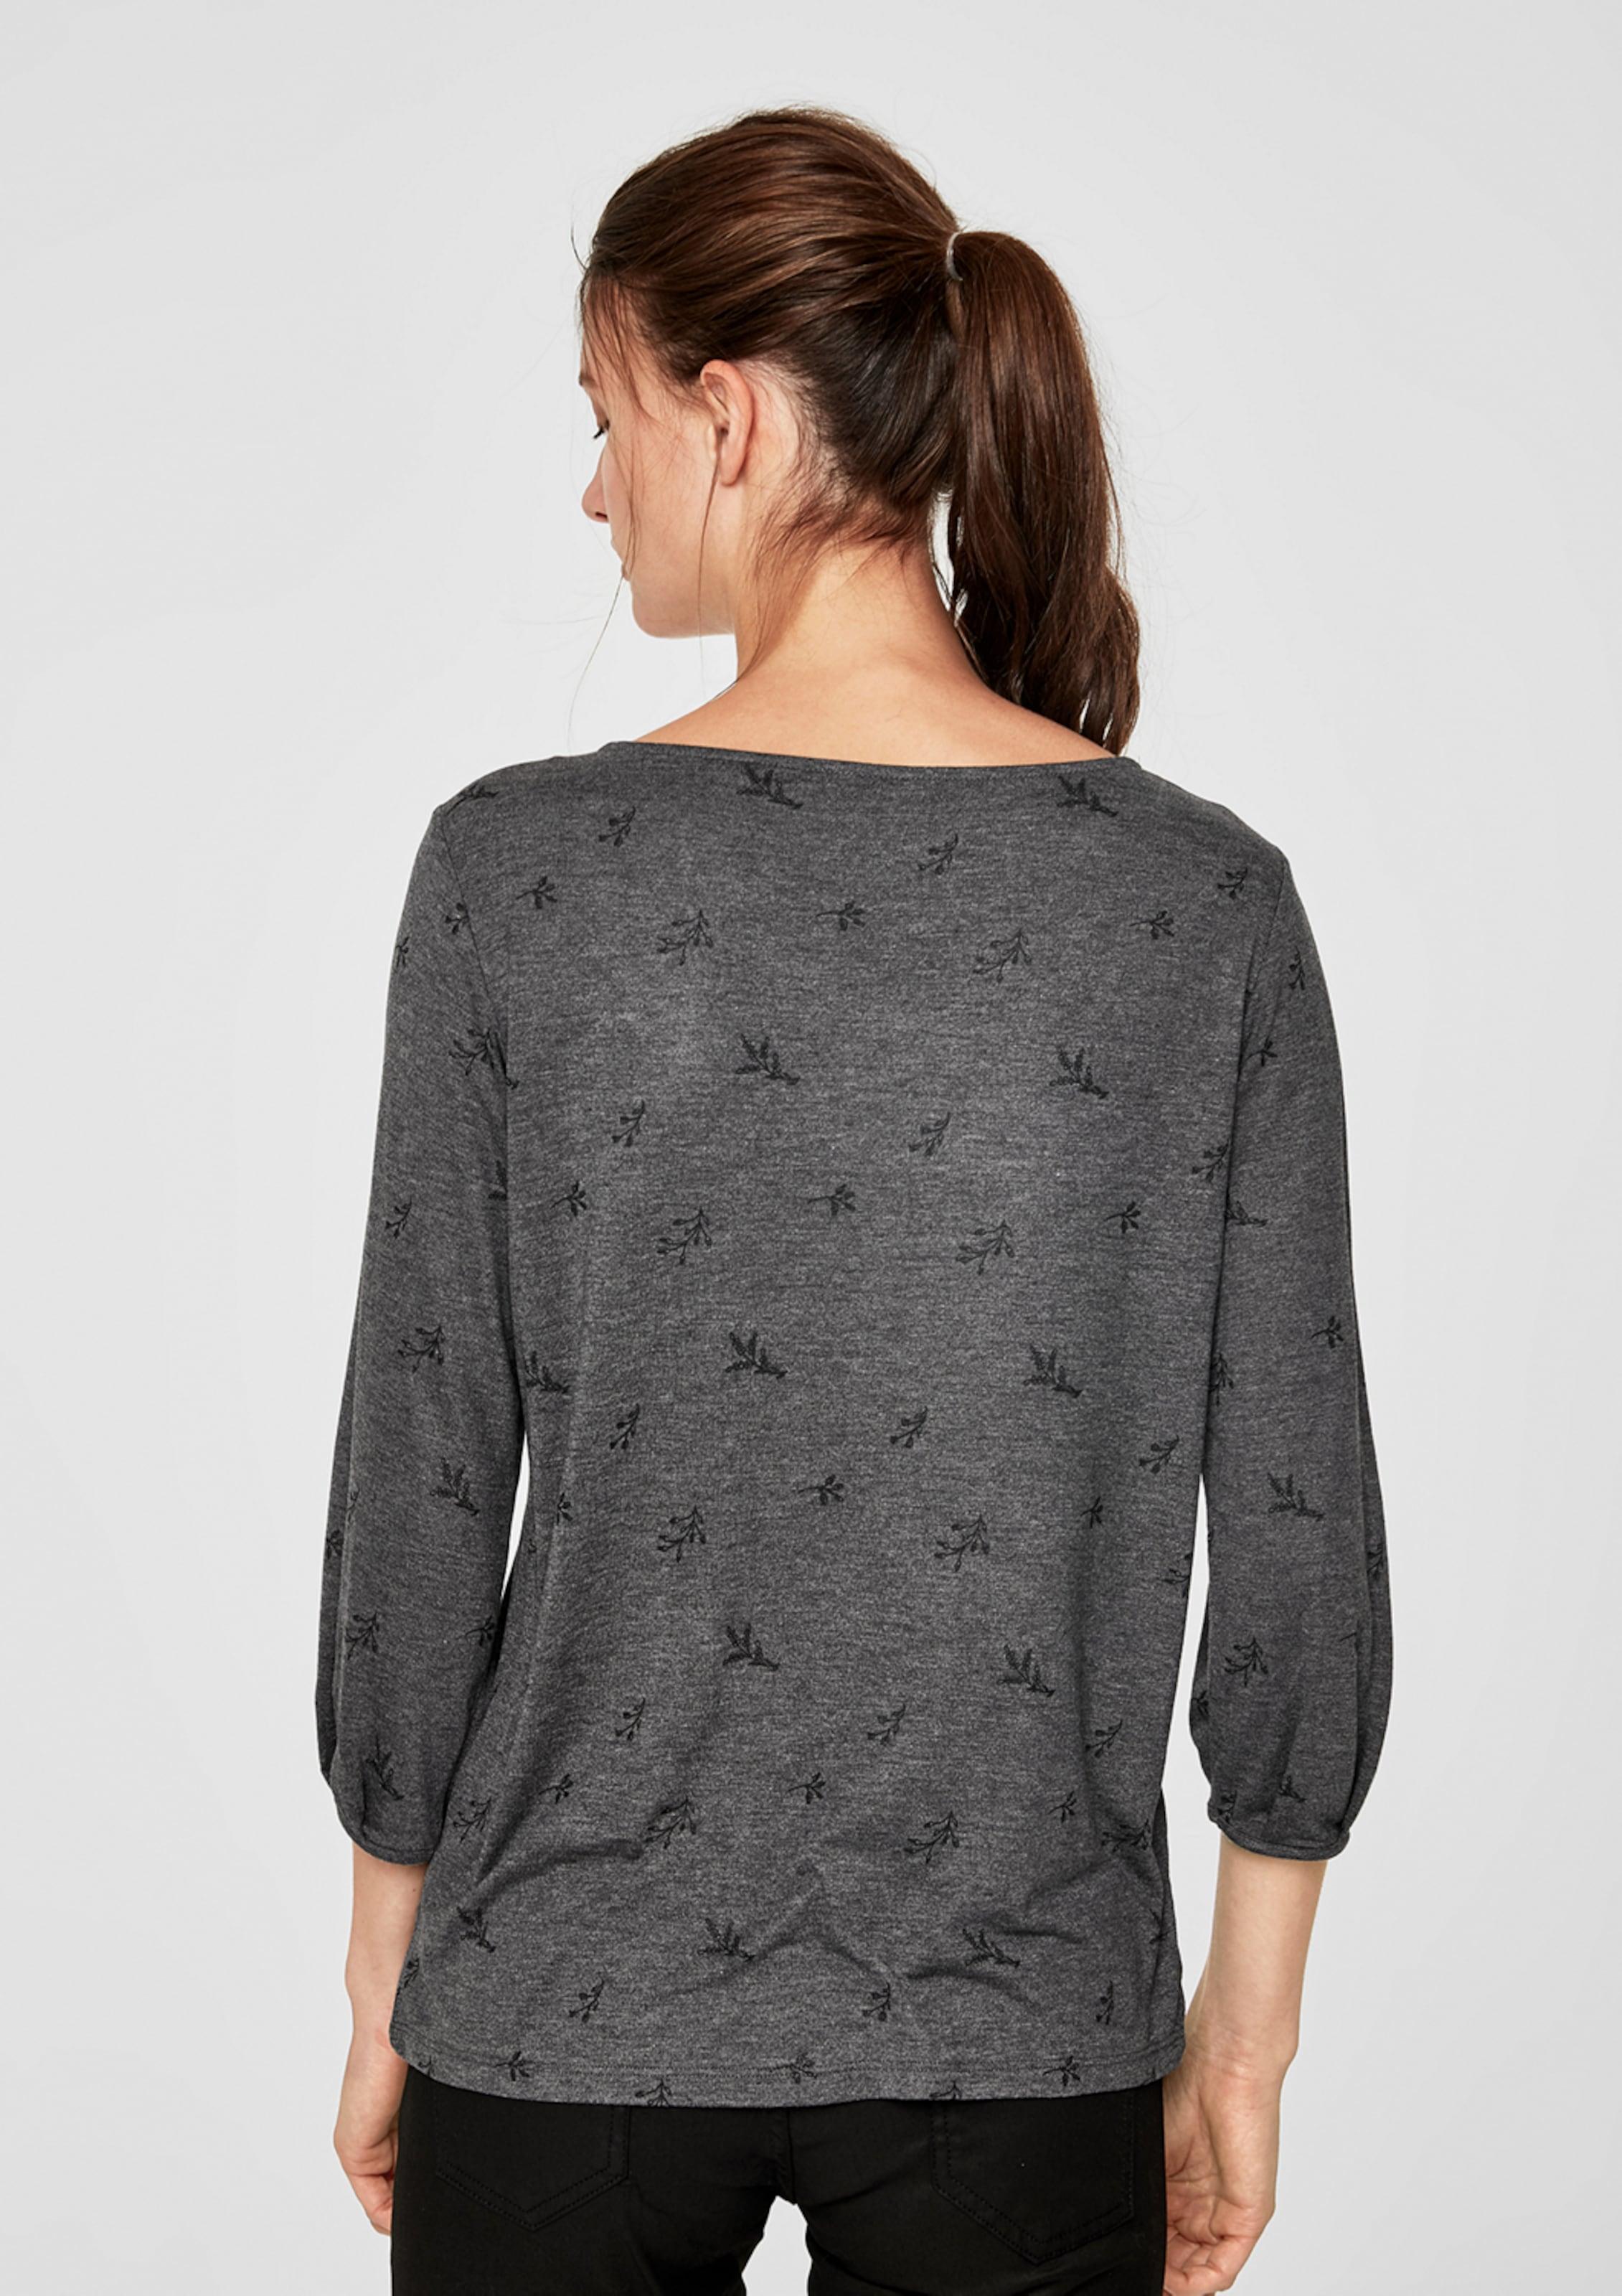 oliver Red S Shirt In Graumeliert Label 80wmOvnN